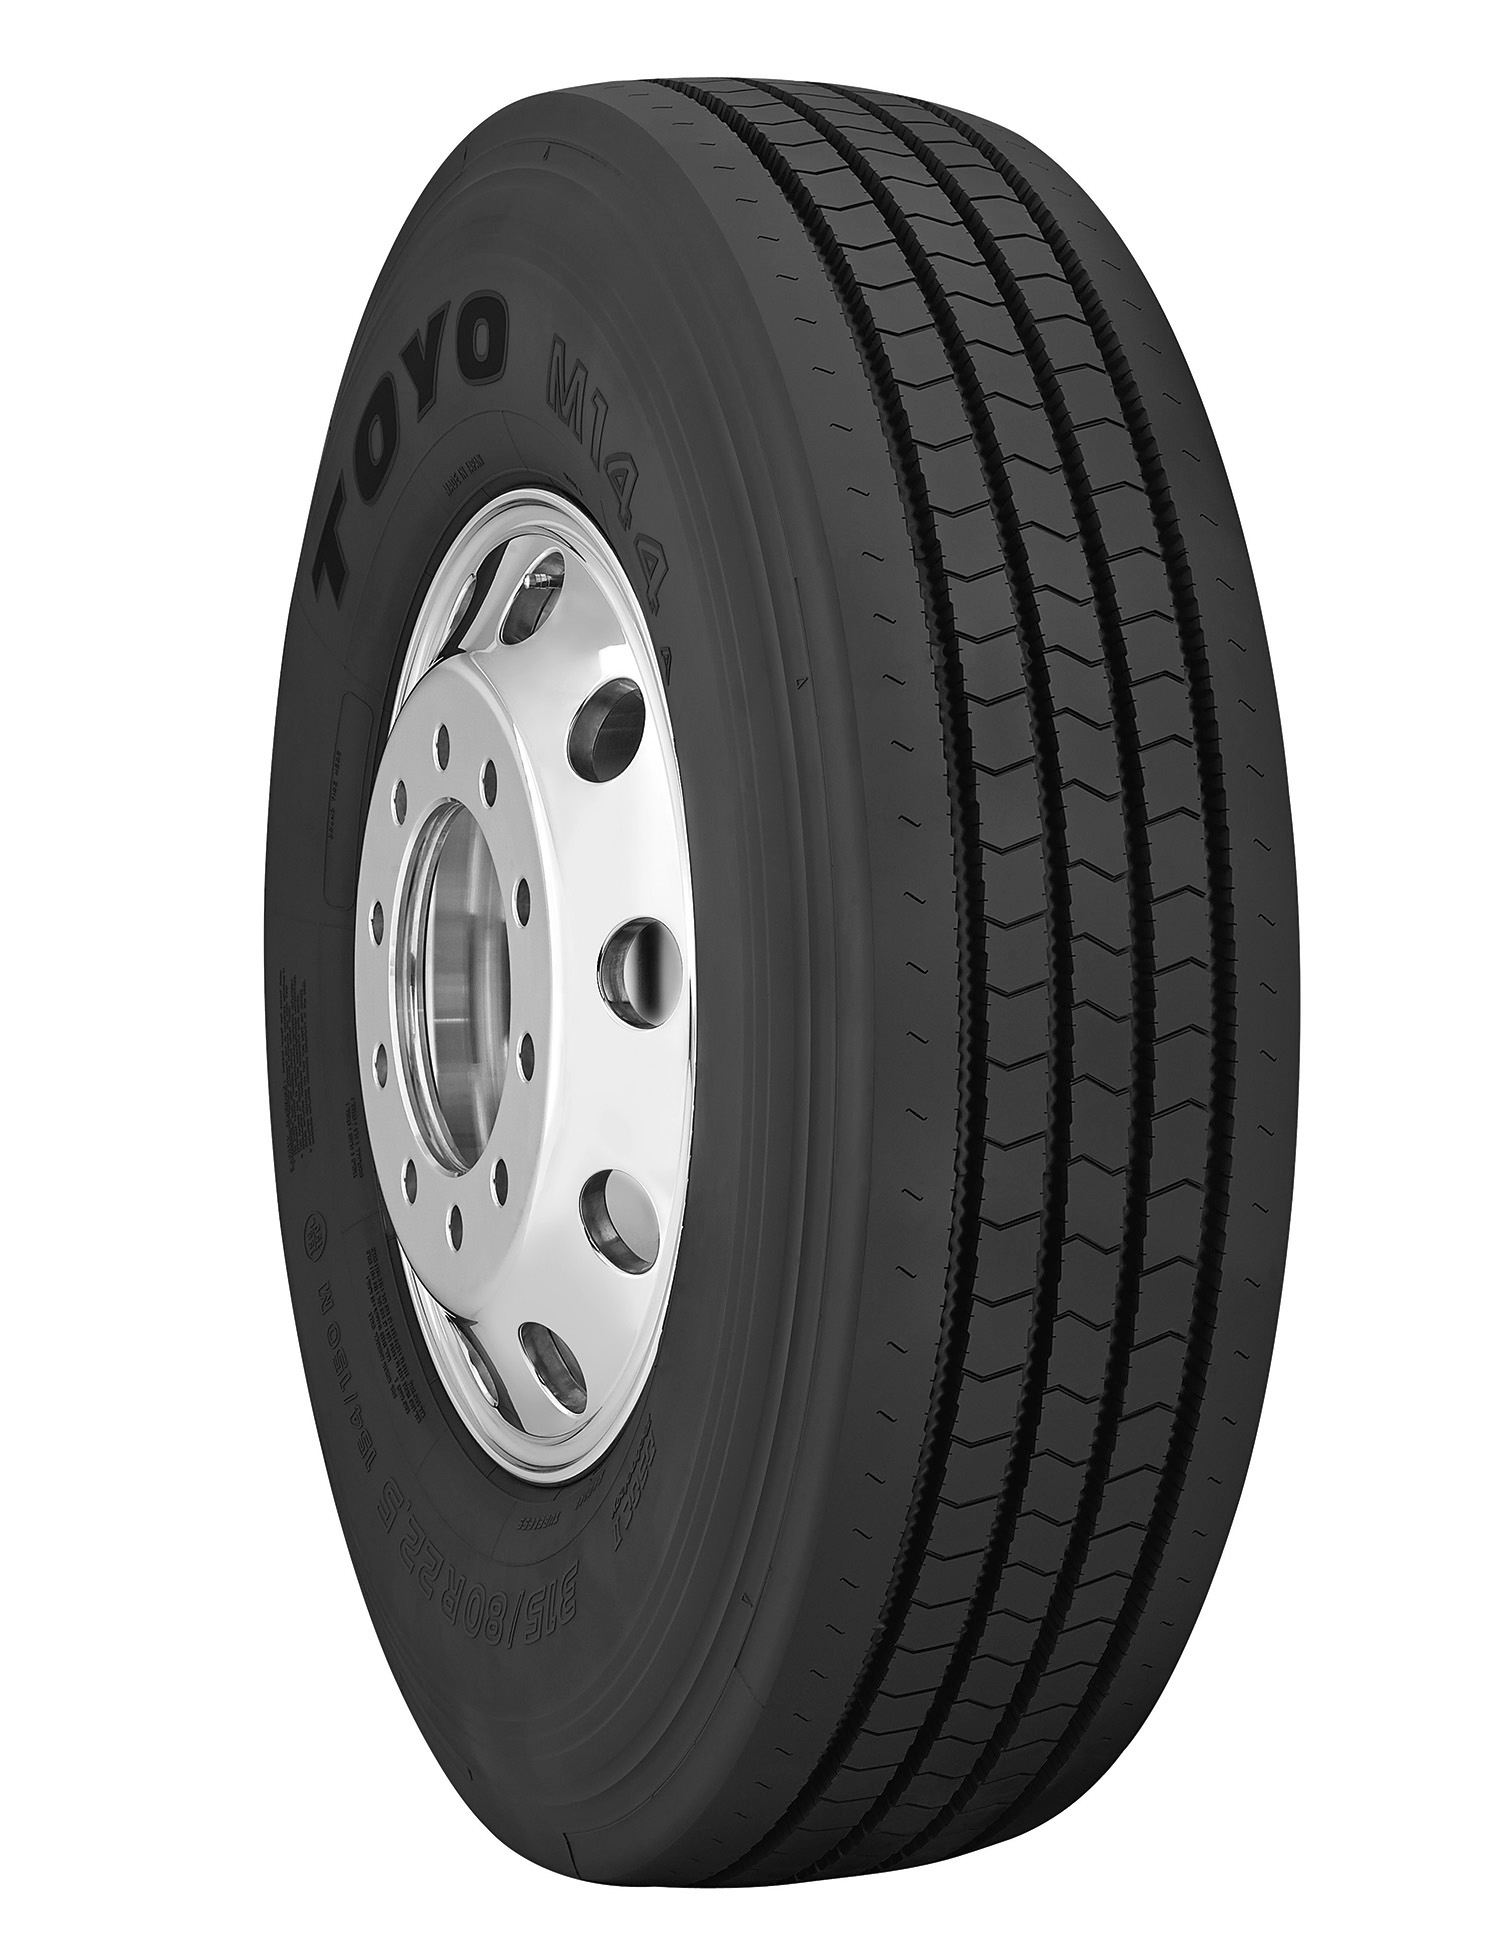 Toyo has a new medium truck tire, iPad App